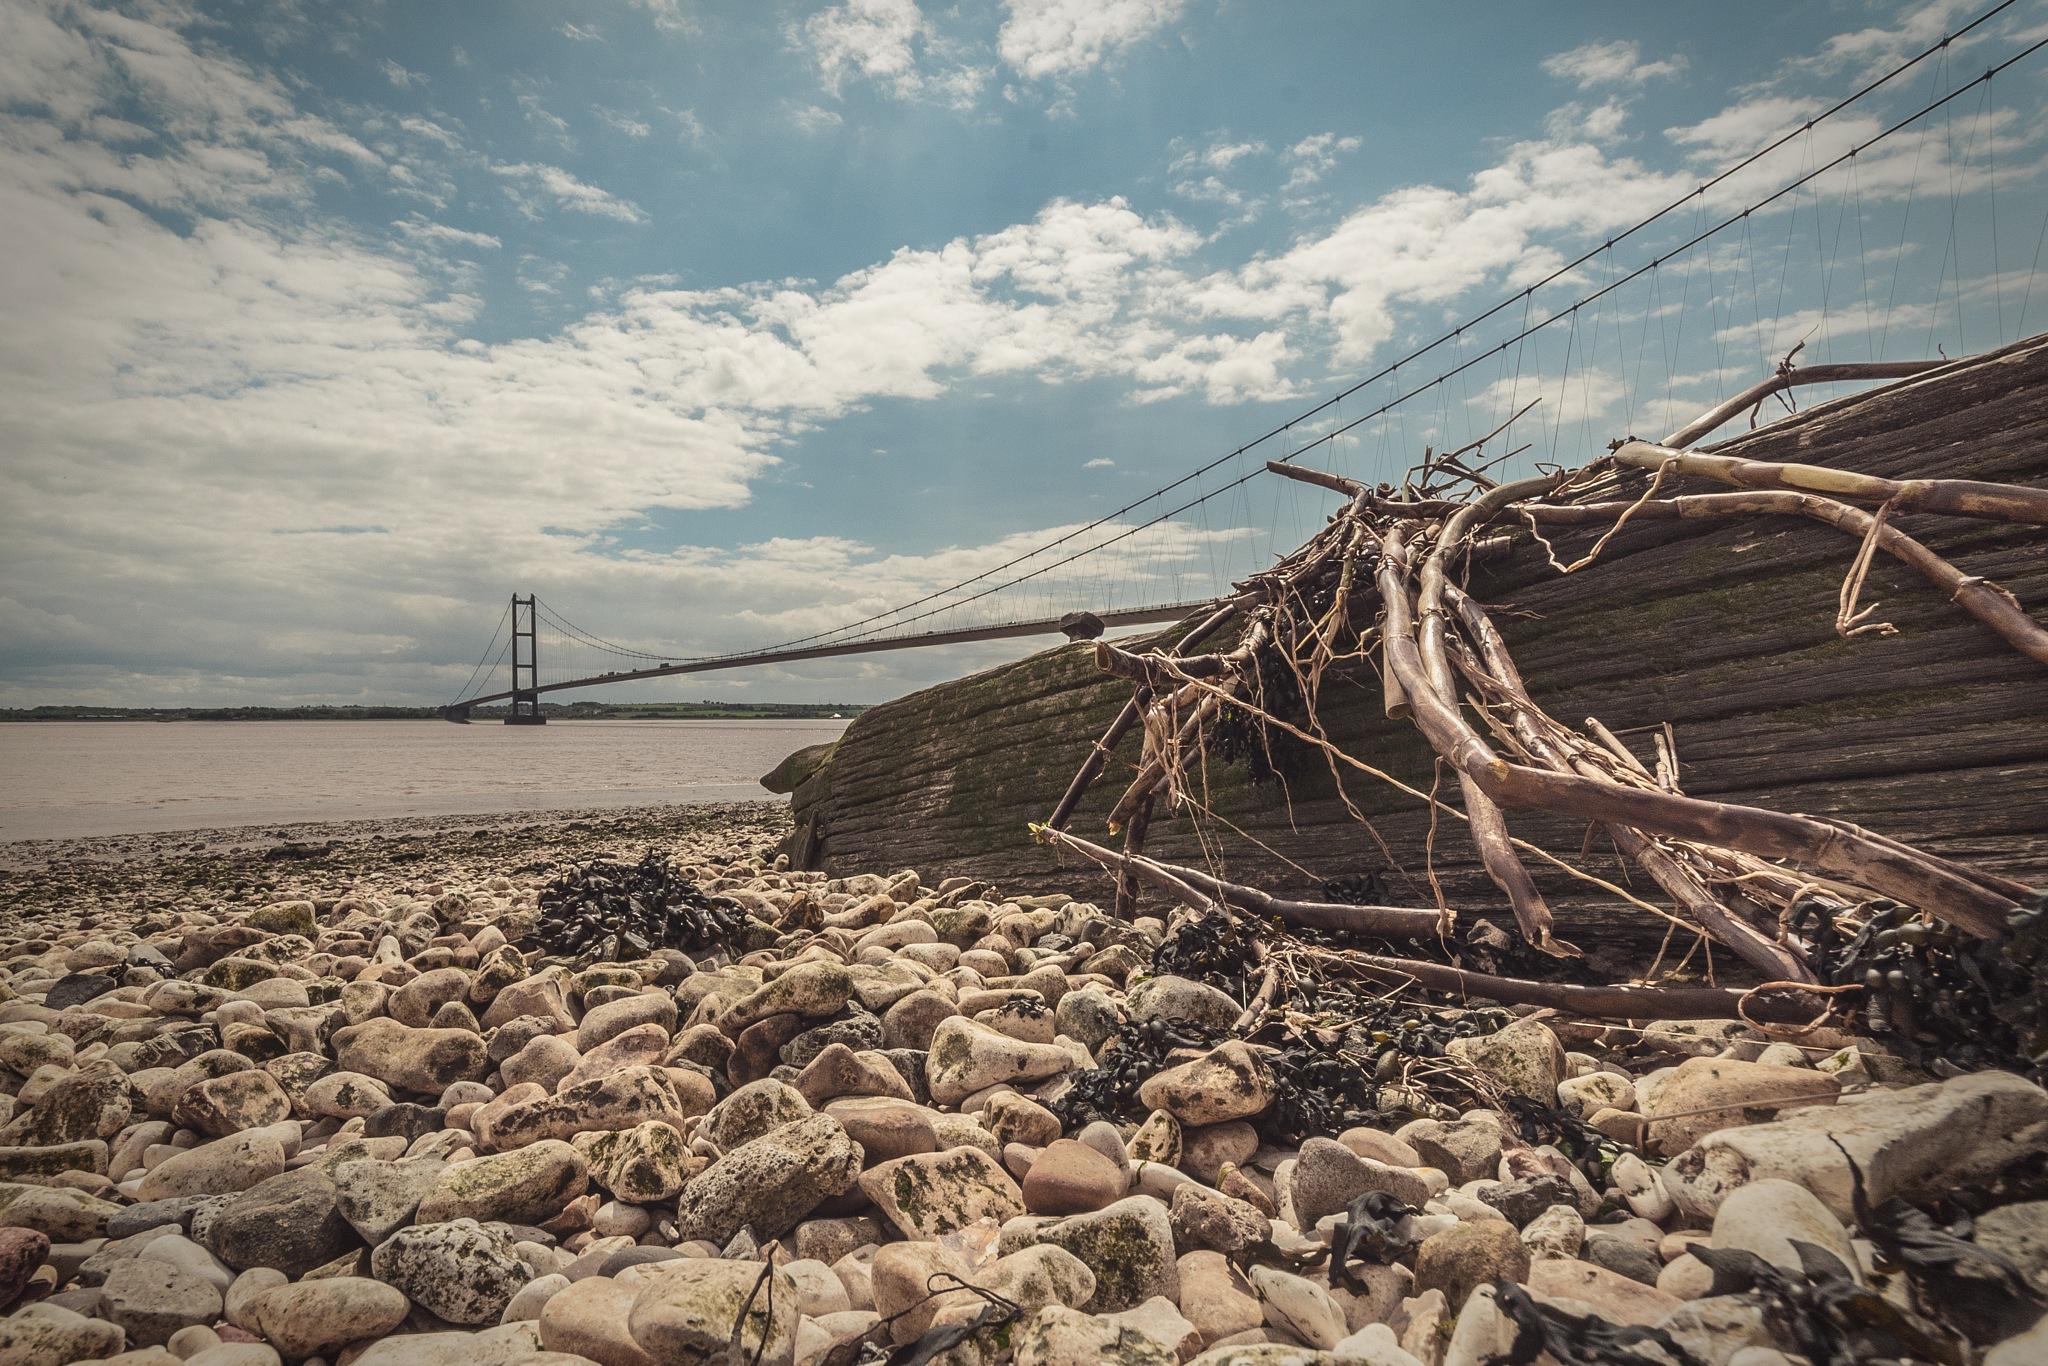 Humber Bridge by simon.oneill.18